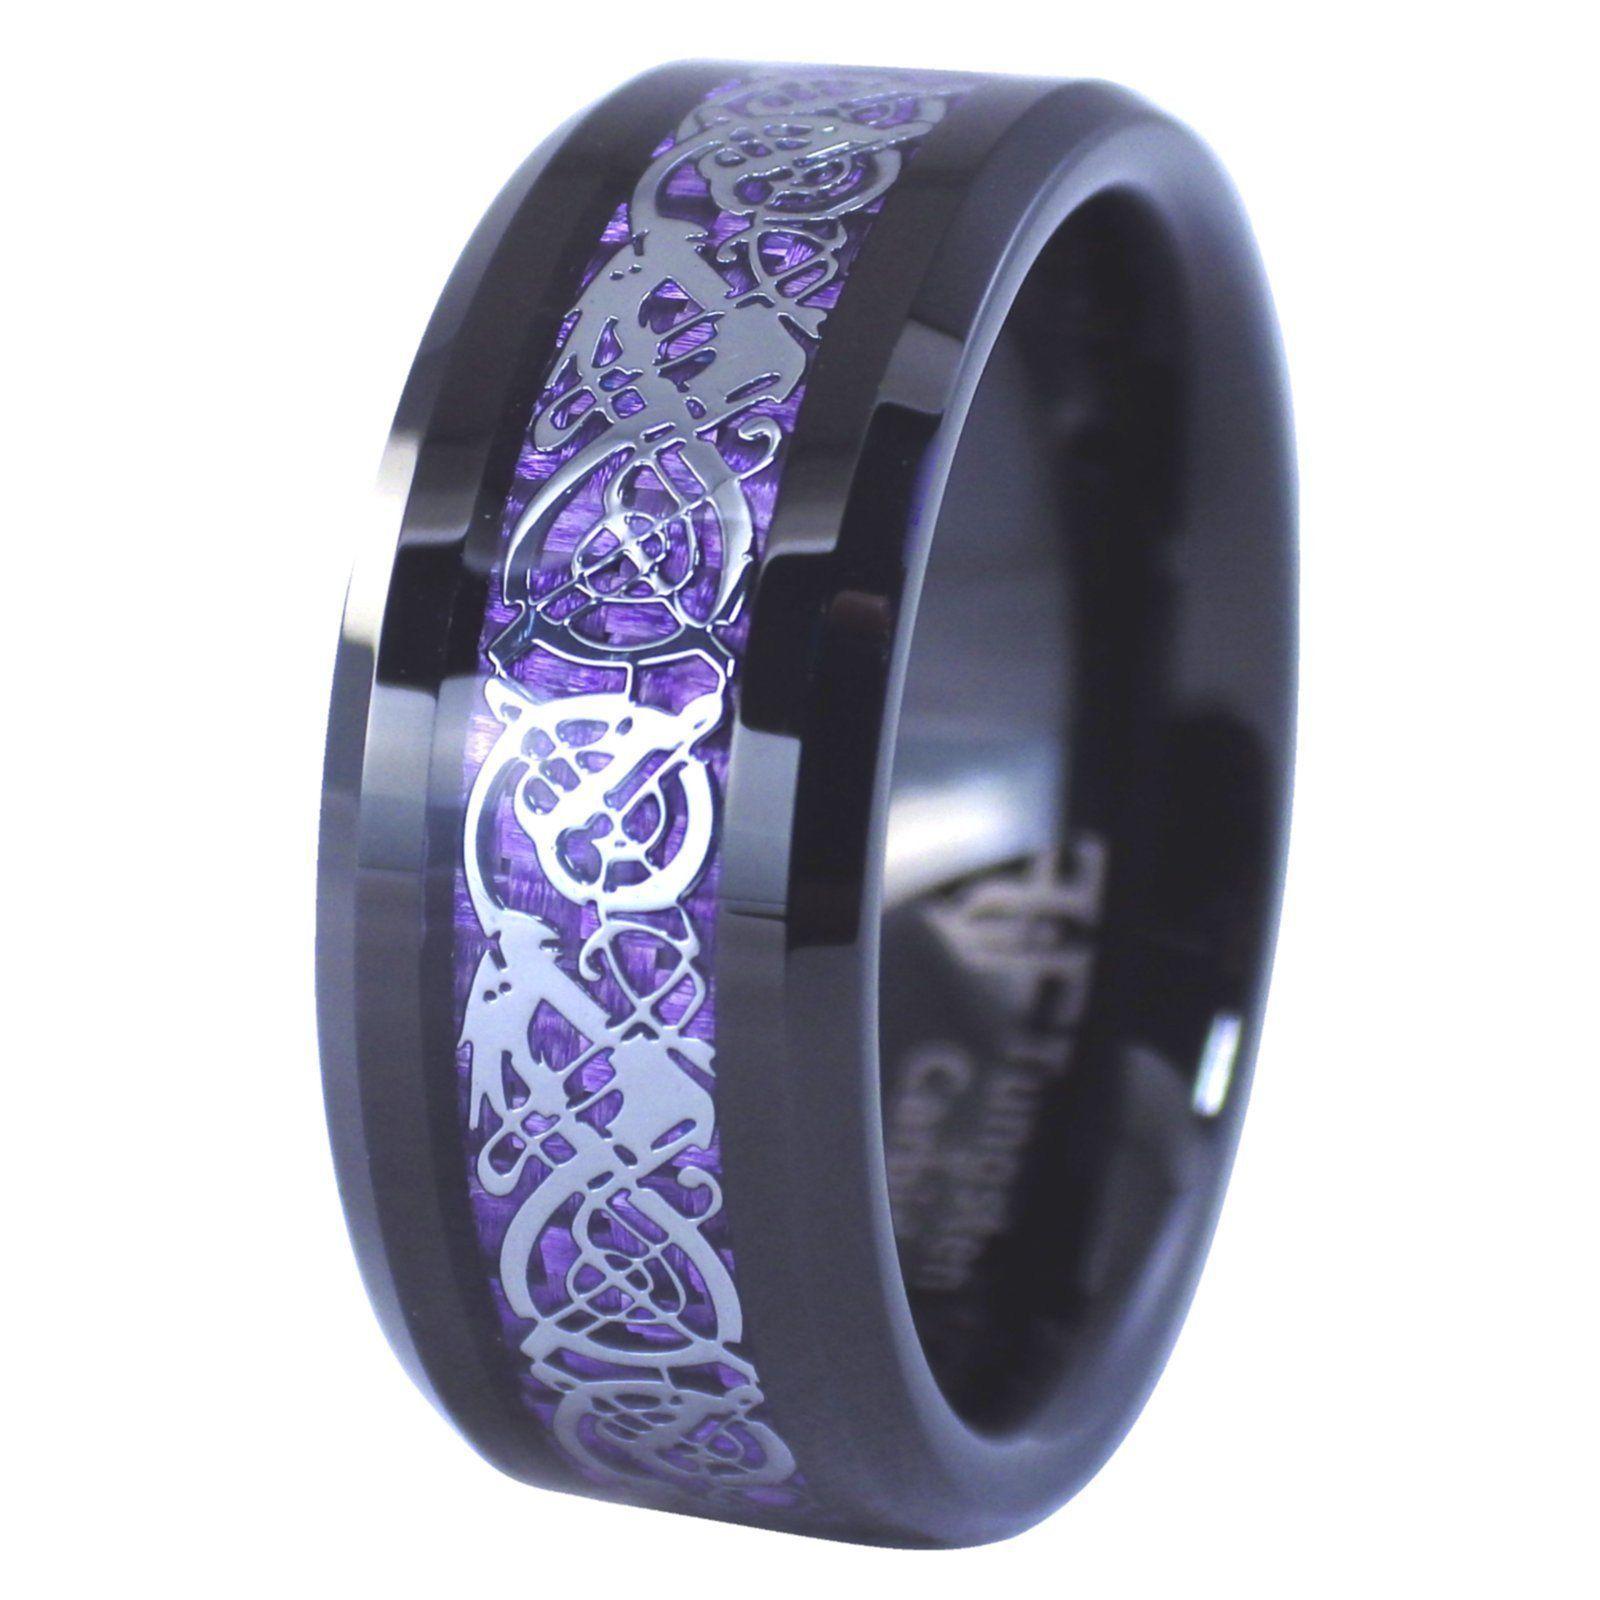 Geti Titanium Celtic Knot Engraved 6mm Wedding Ring